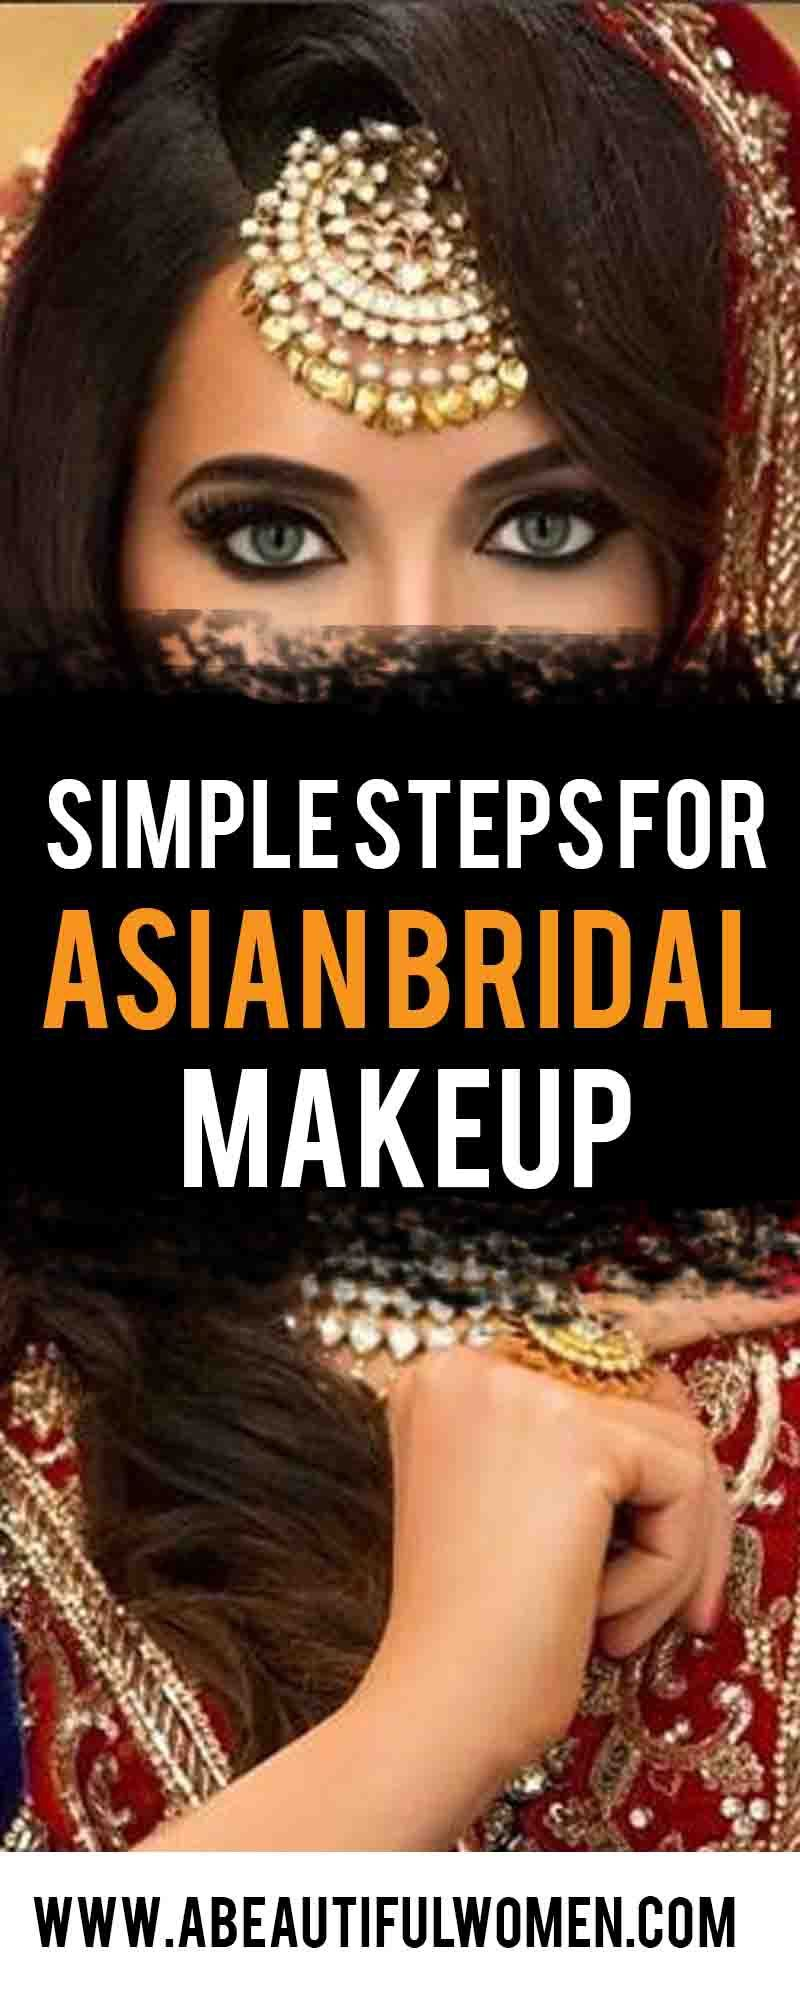 10 Simple Steps For Asian Bridal Makeup aBeautiful Women